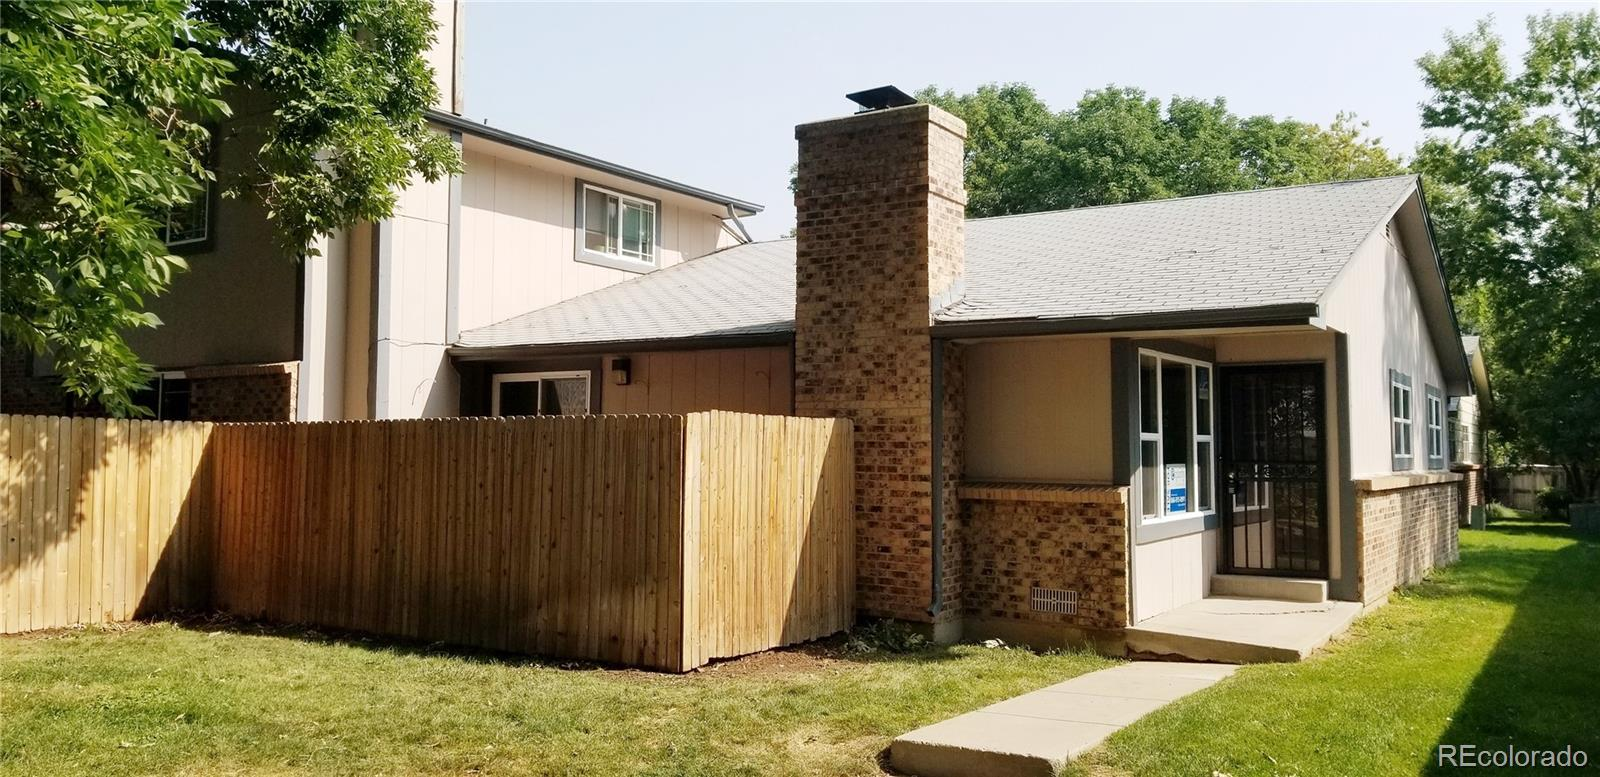 44 N Nome Way #D, Aurora, CO 80012 - Aurora, CO real estate listing